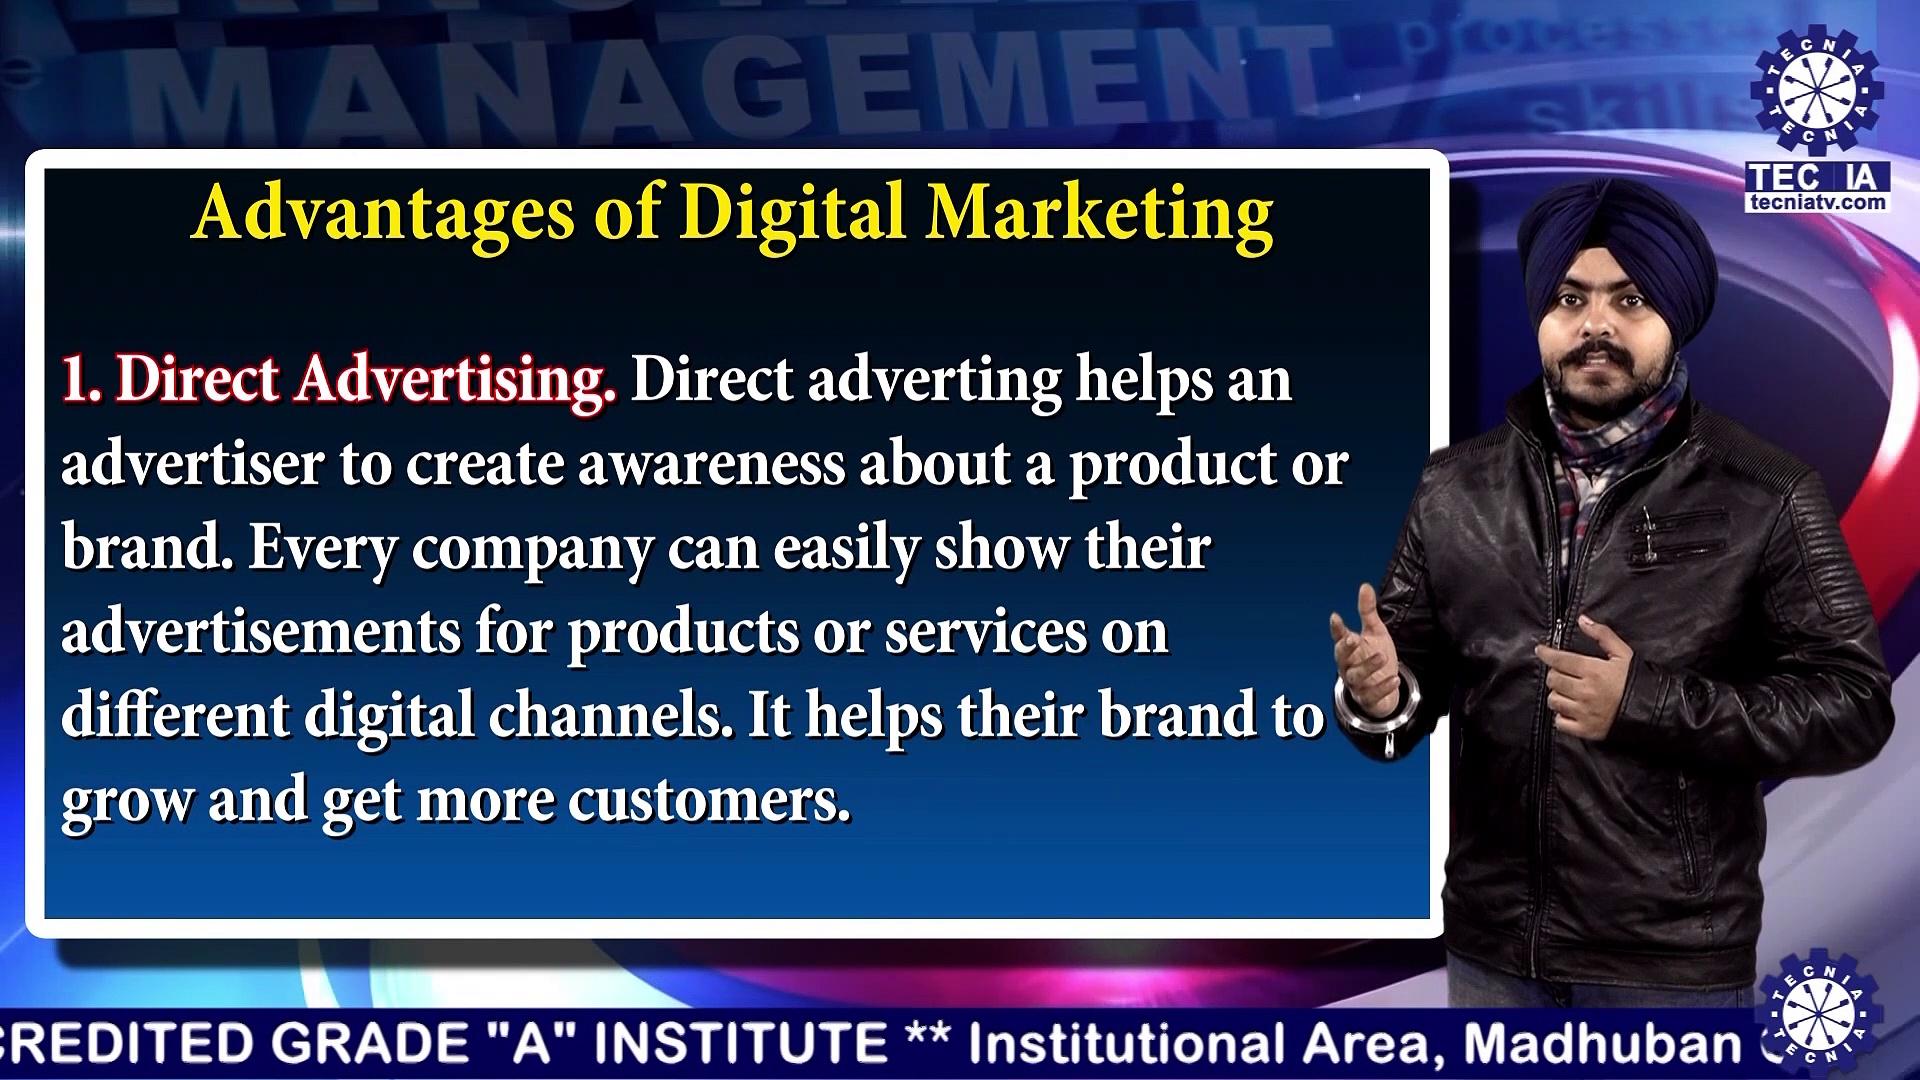 BBA || Mr. INDERPREET SINGH ||  Advantages & Challenges of Digital Marketing || TIAS || TECNIA TV